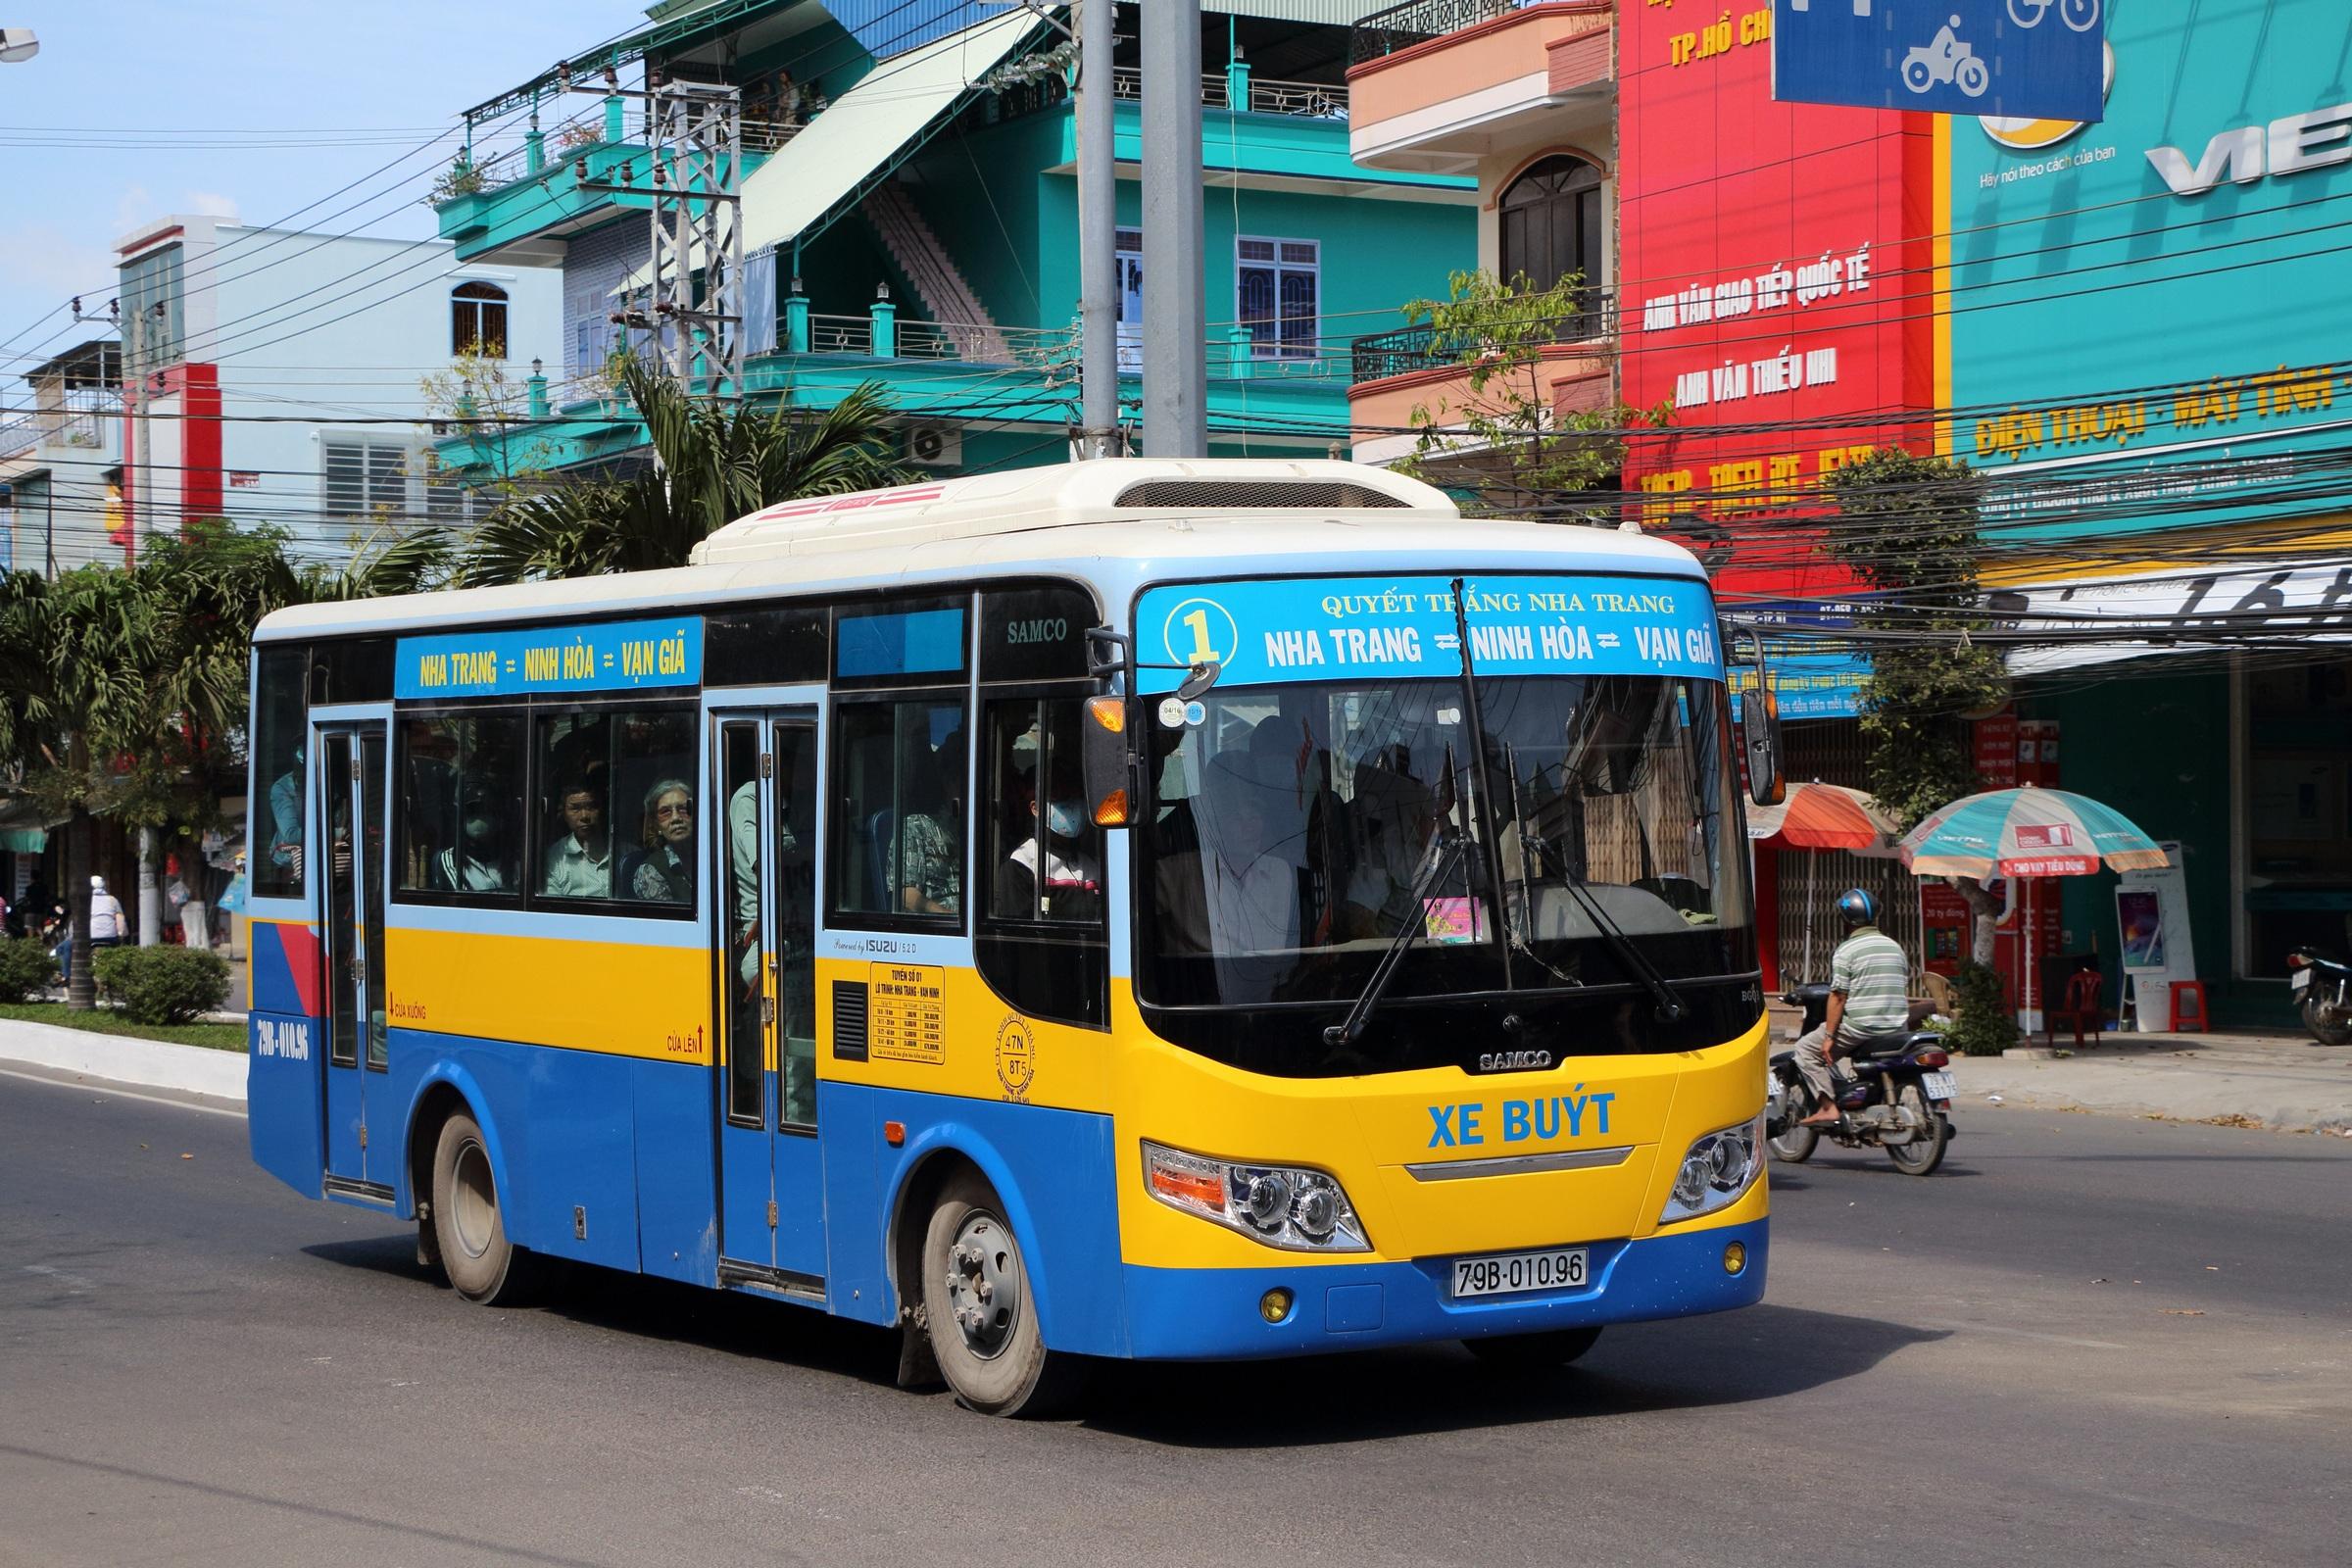 Автобус в Нячанг